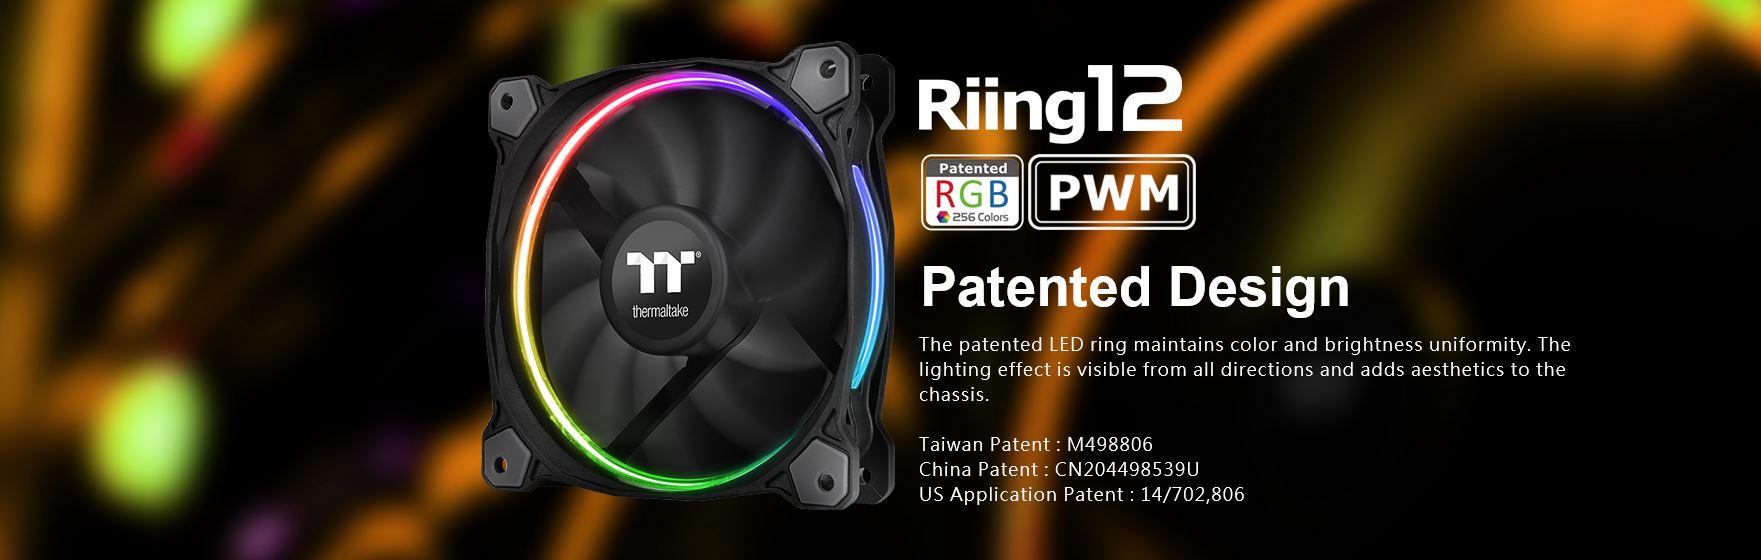 Riing TTP Patent